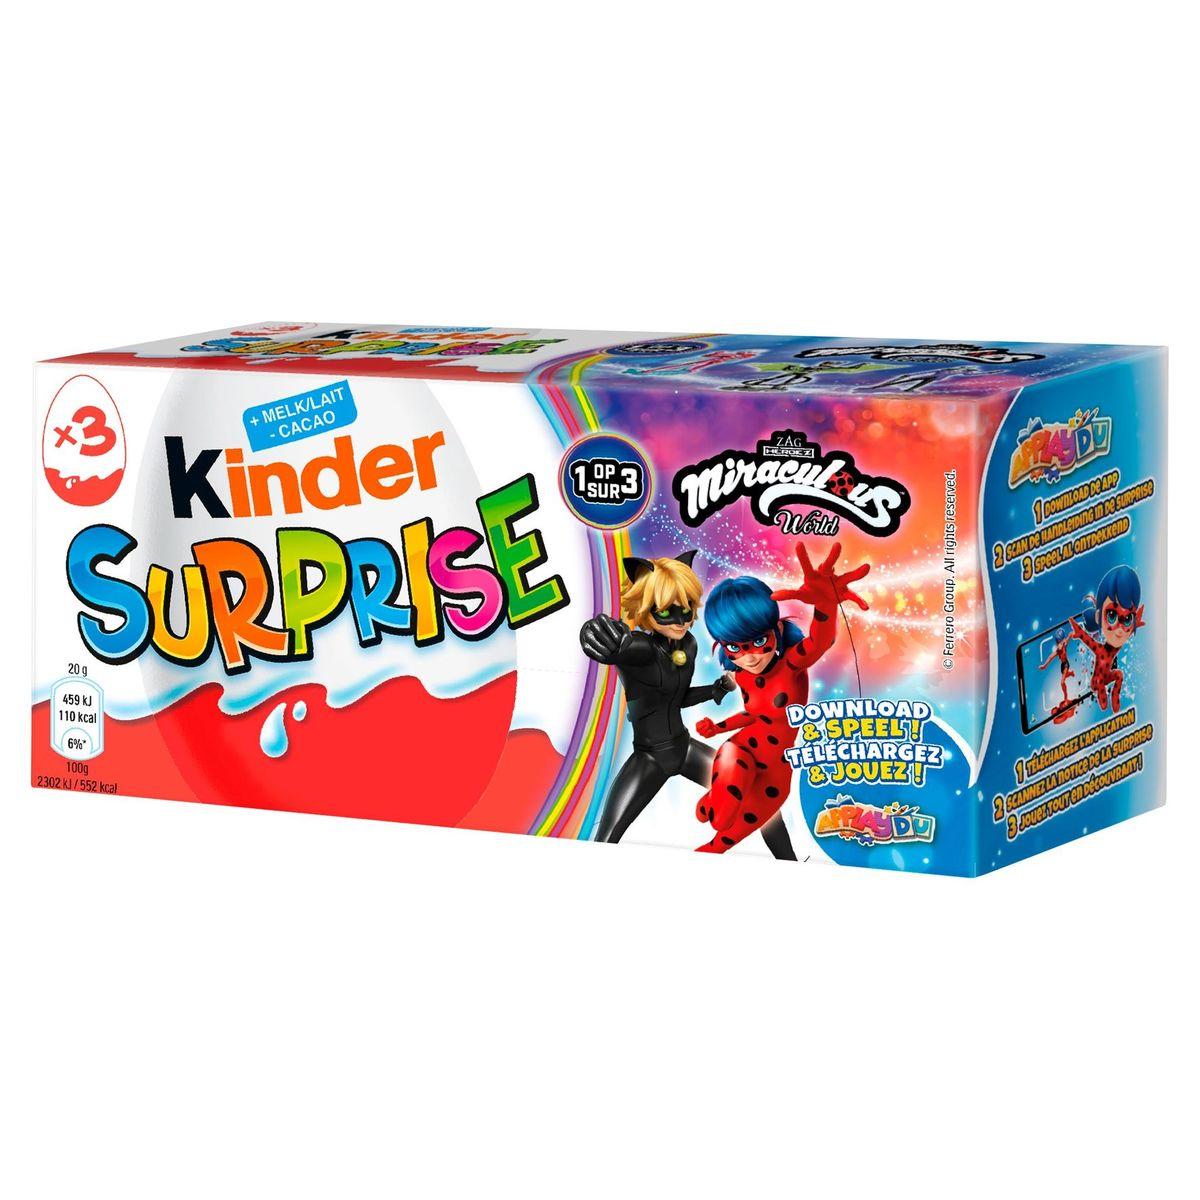 Kinder Surprise 3 x 20 g